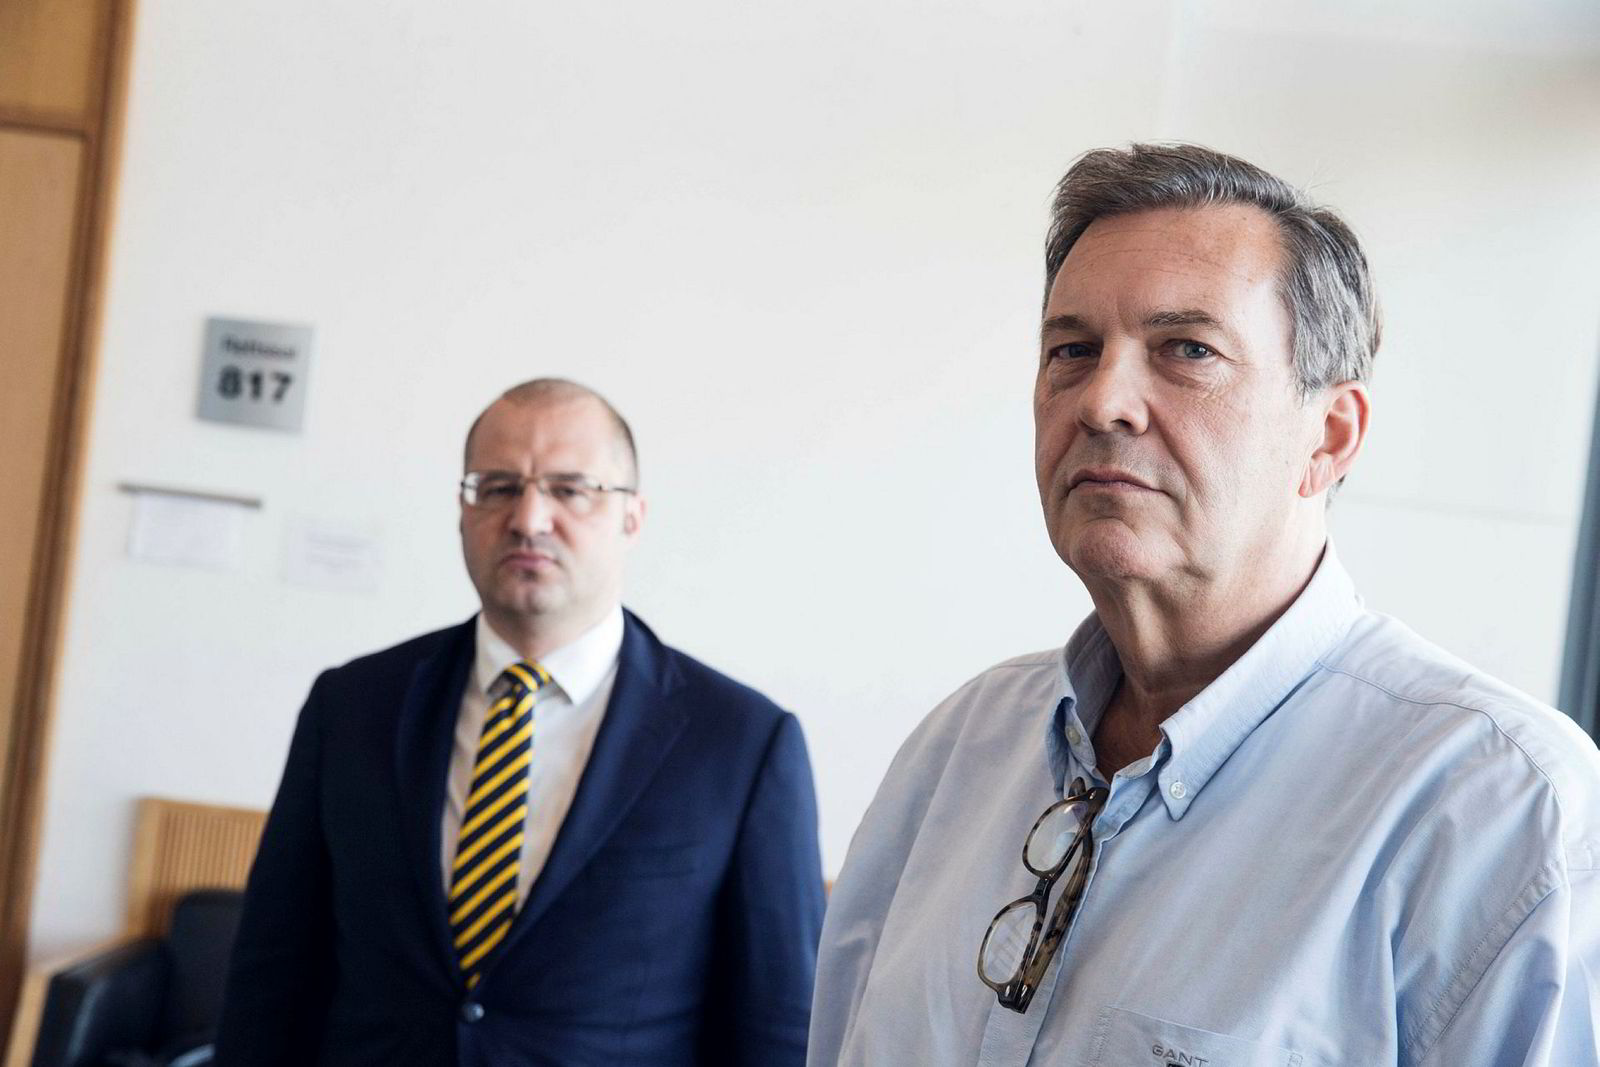 Jan Vestrum i Oslo tingrett høsten 2018. Her med sin forsvarer, advokat Håkon Juell Hassel i advokatfirmaet Elden.